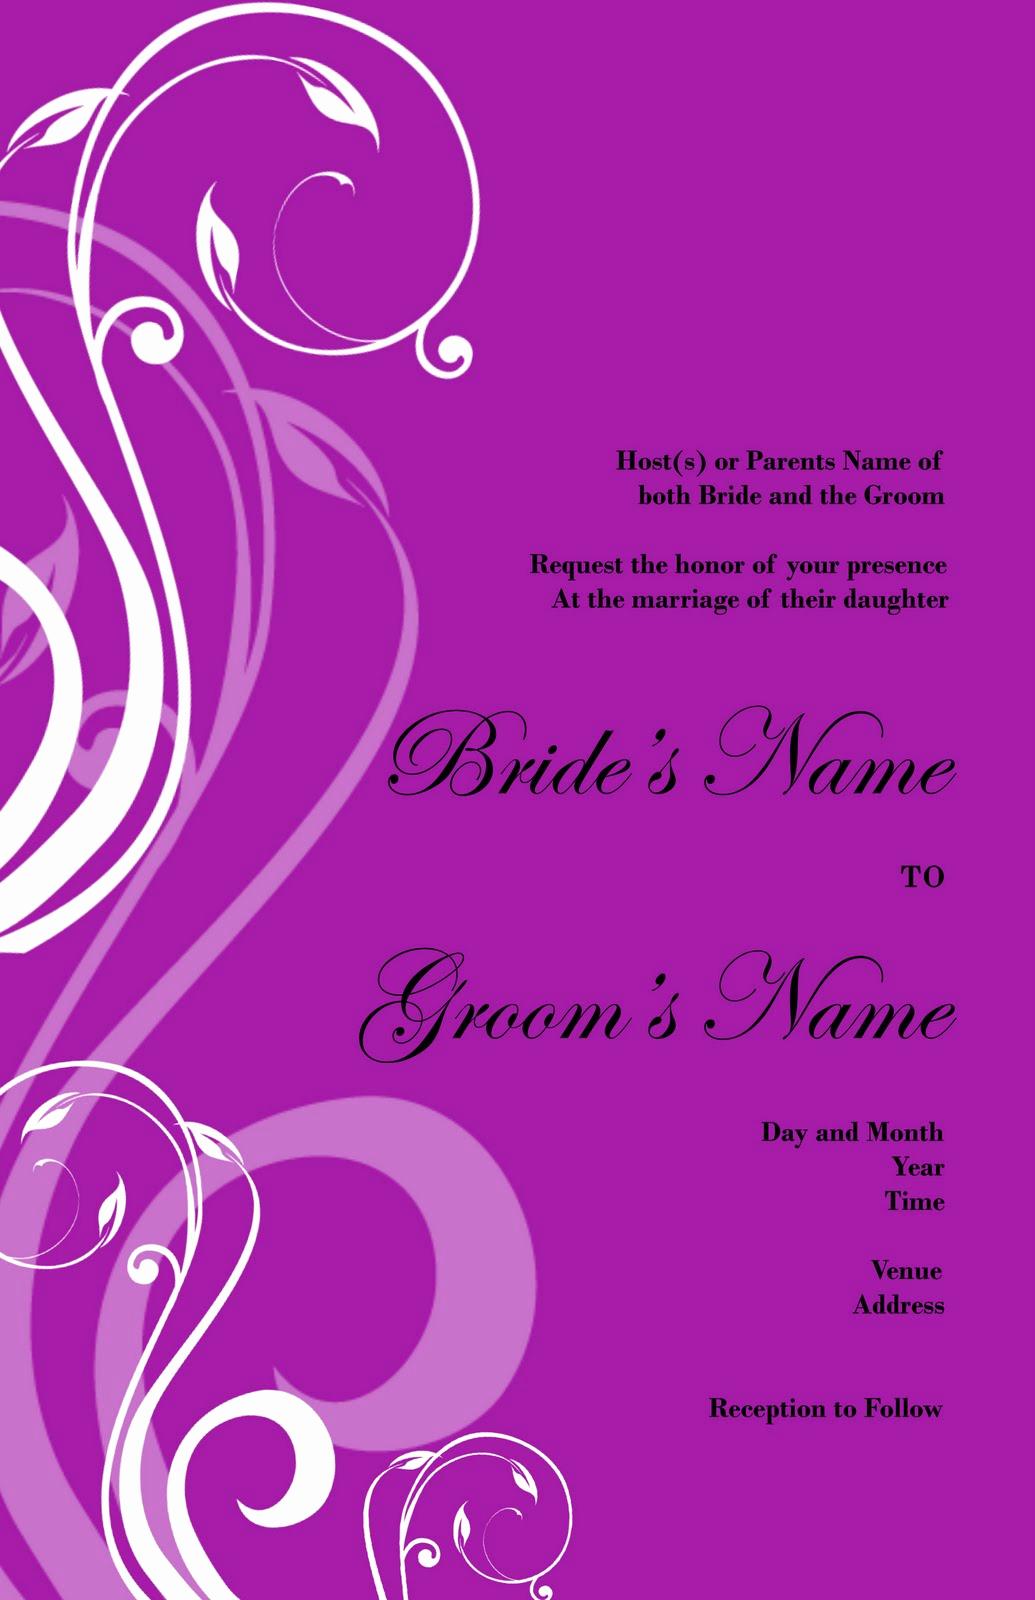 purple wedding invitation background designs 5